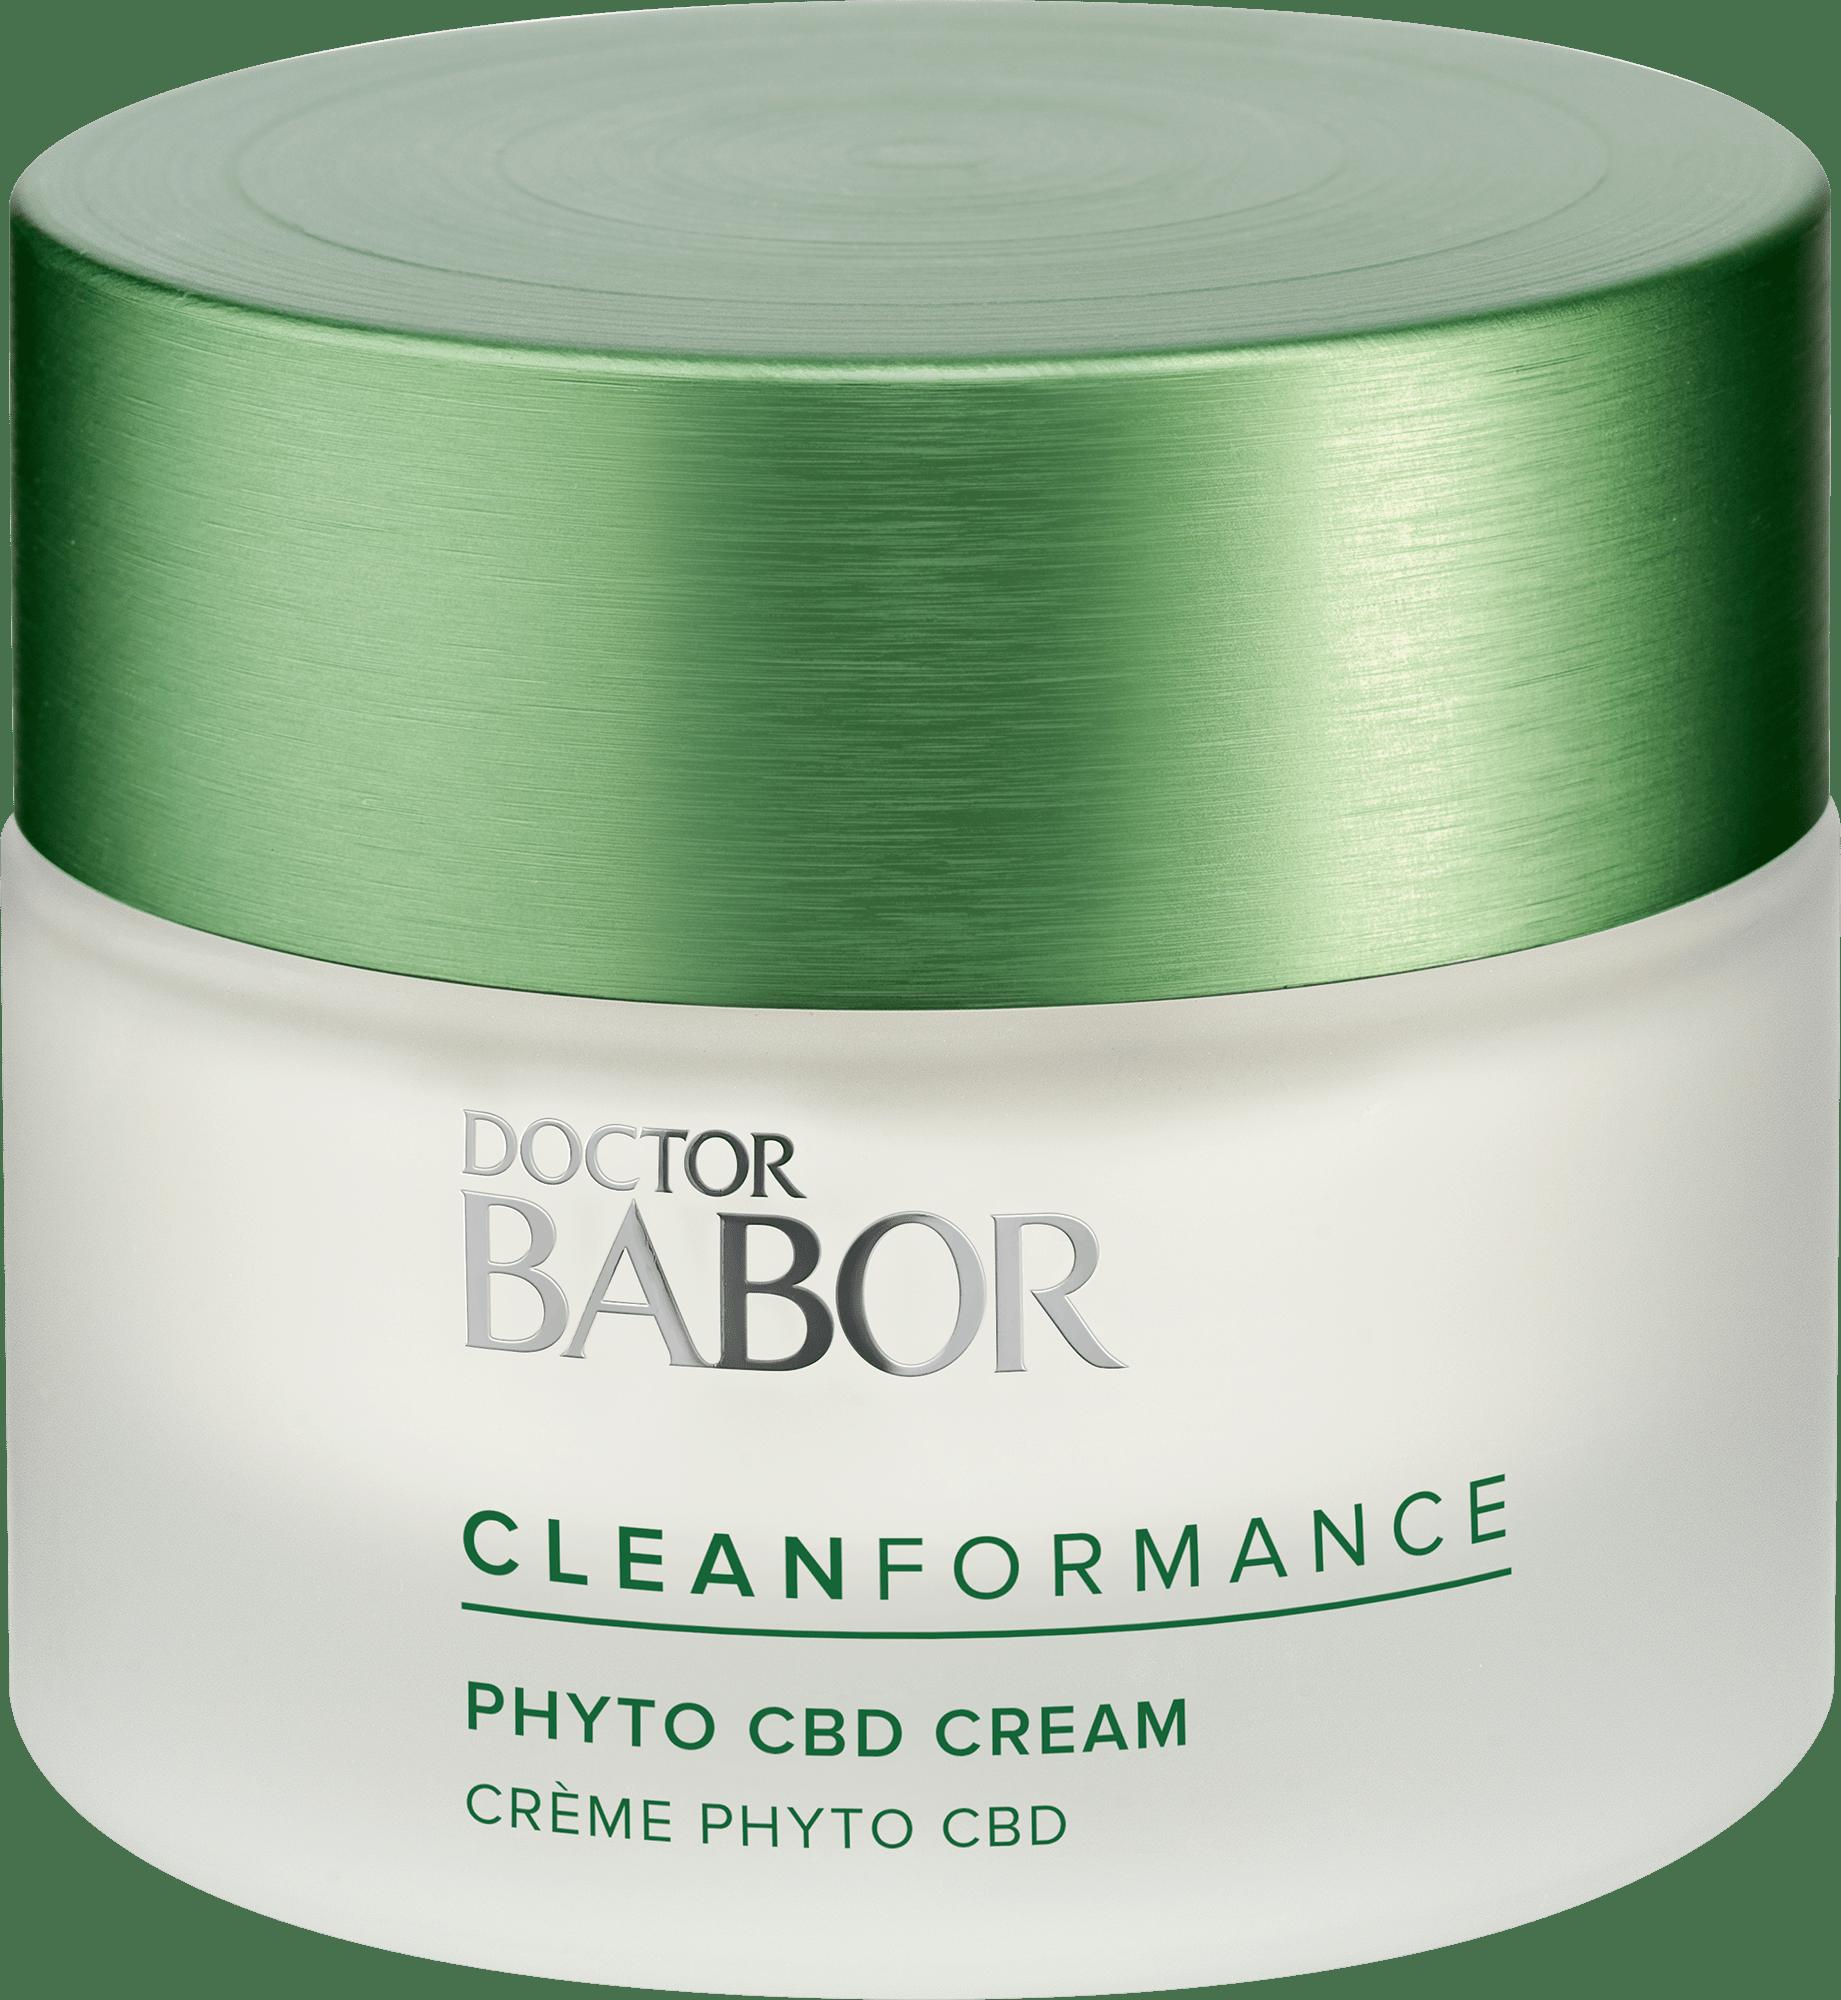 DOCTOR BABOR CLEANFORMANCE Phyto CBD 24h Cream